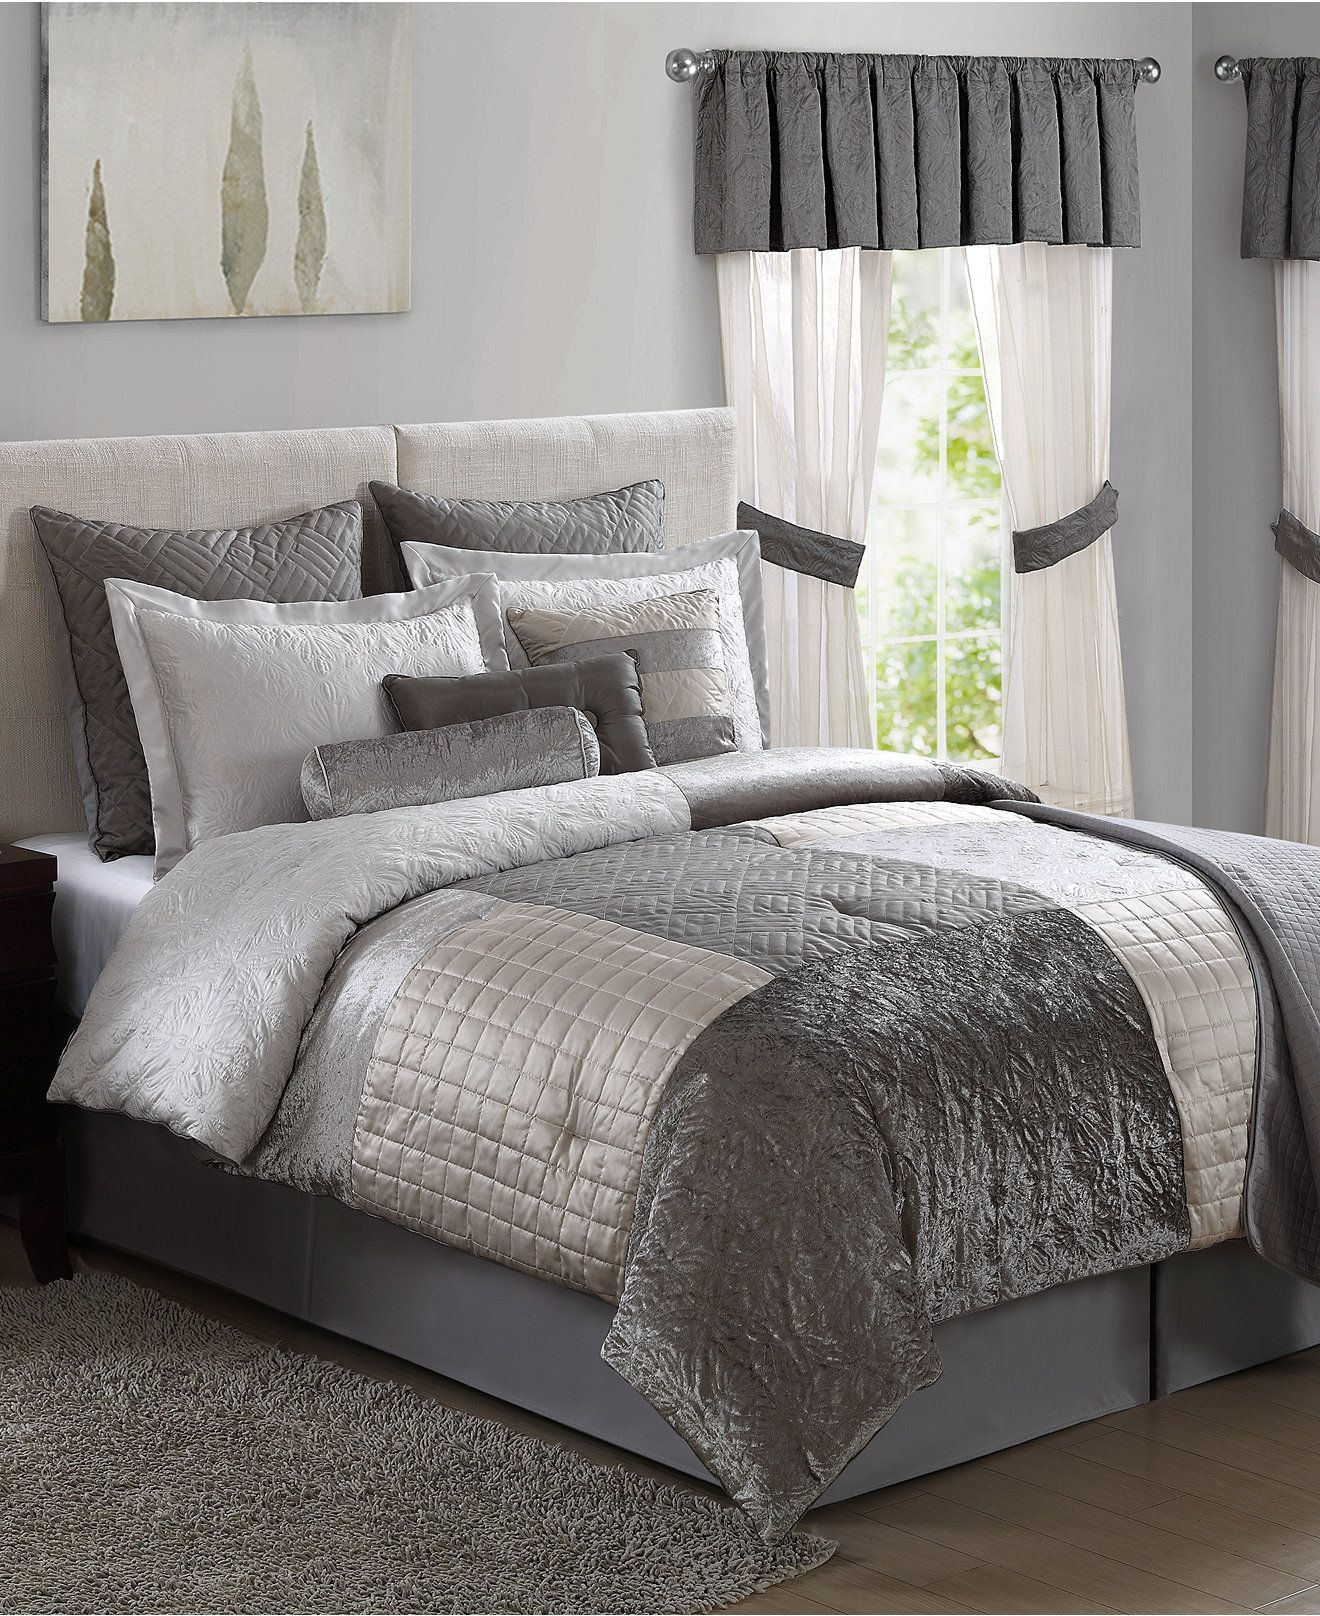 granite 22-piece comforter set - bed in a bag - bed & bath